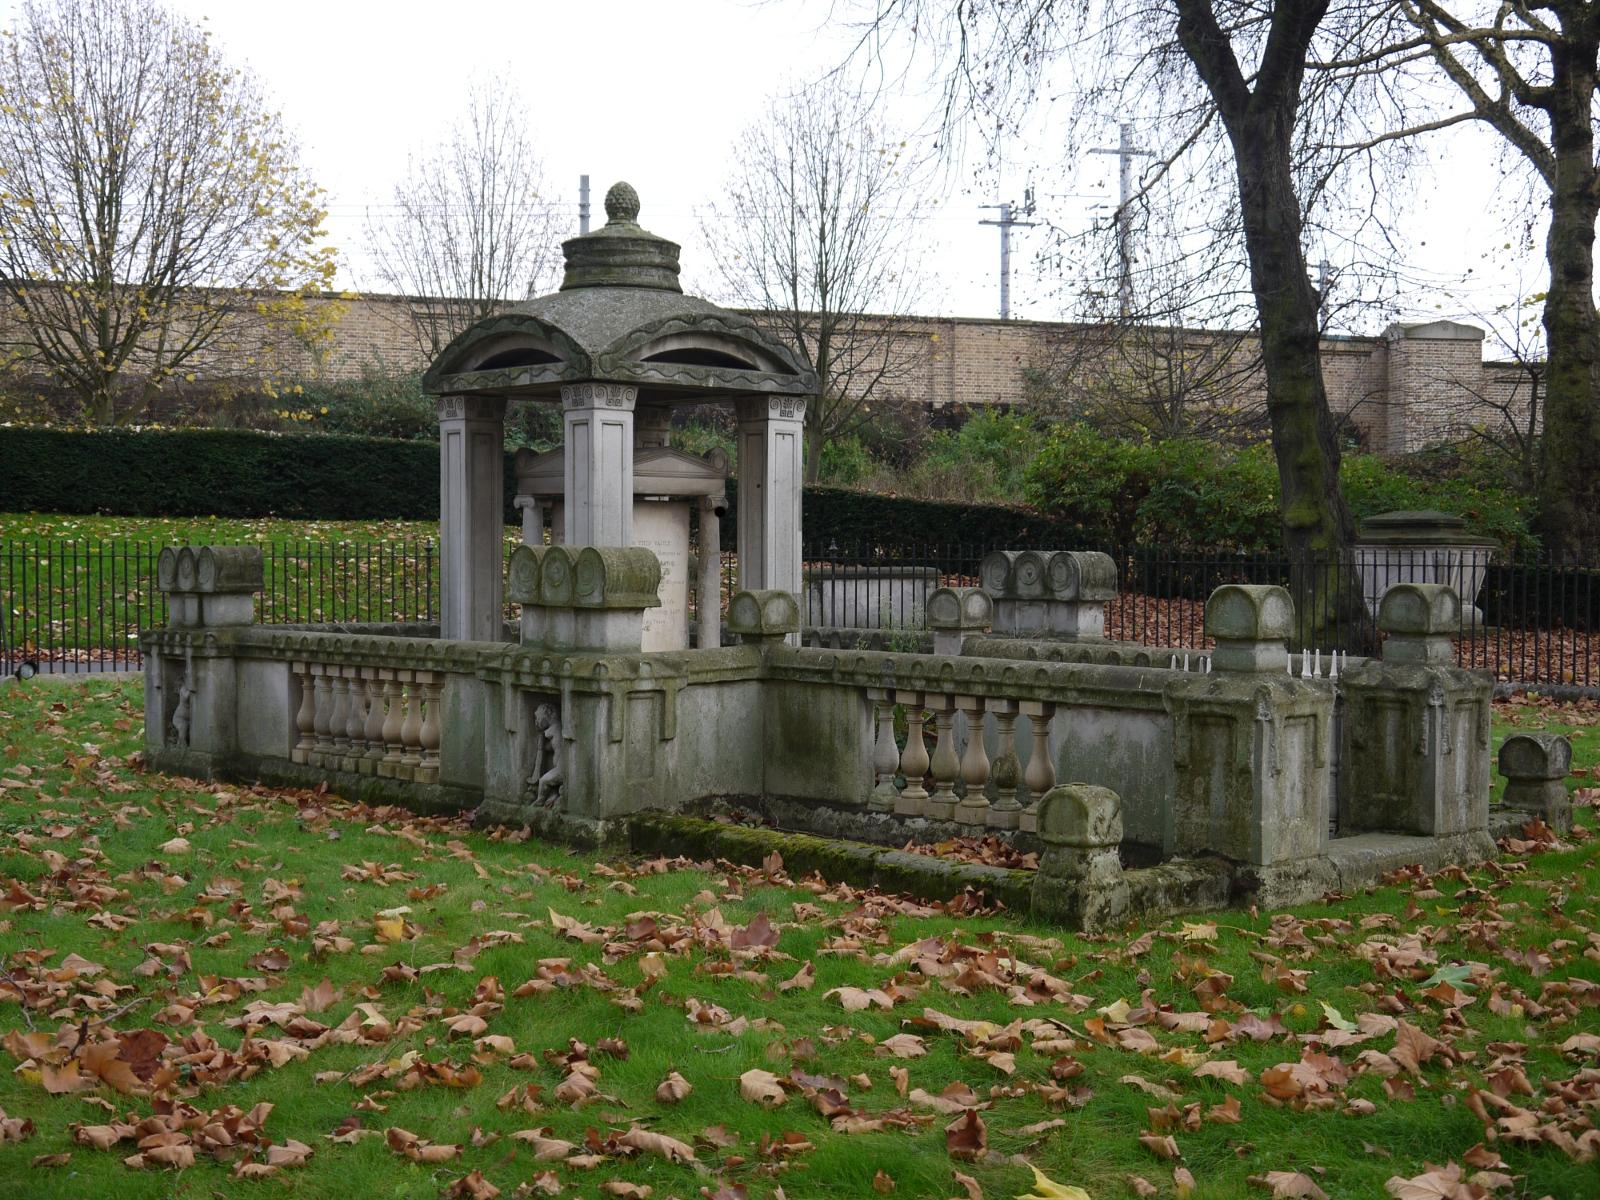 churchyard – The Street Tree